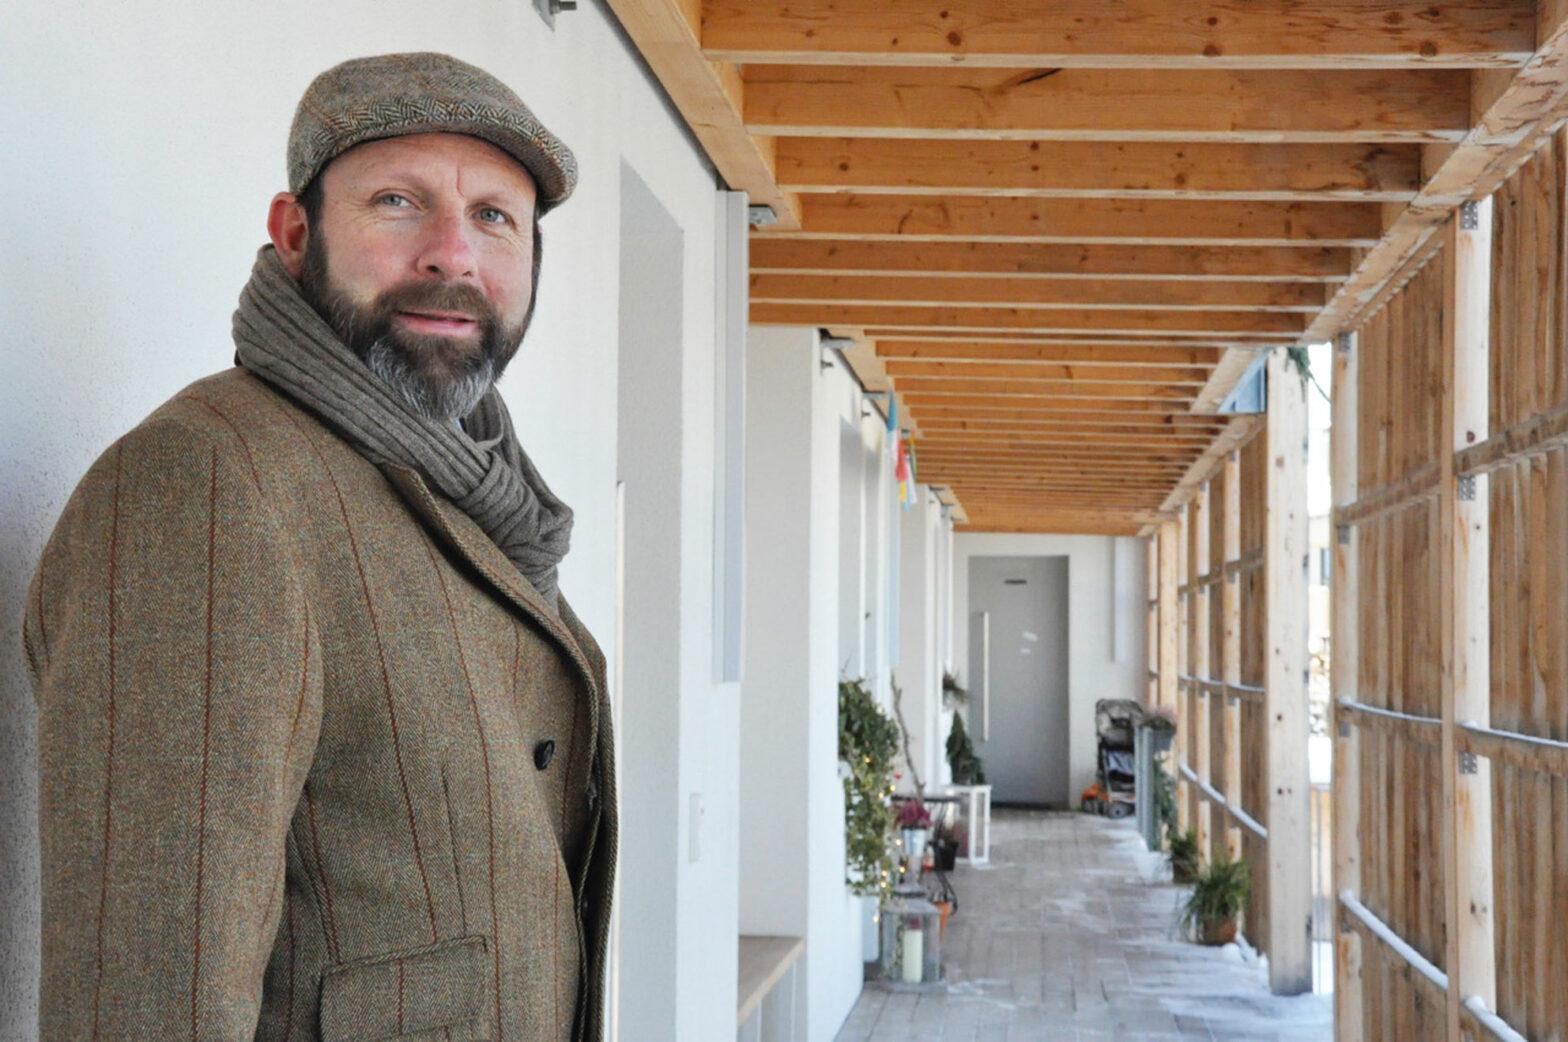 Architekt Sunder-Plassmann